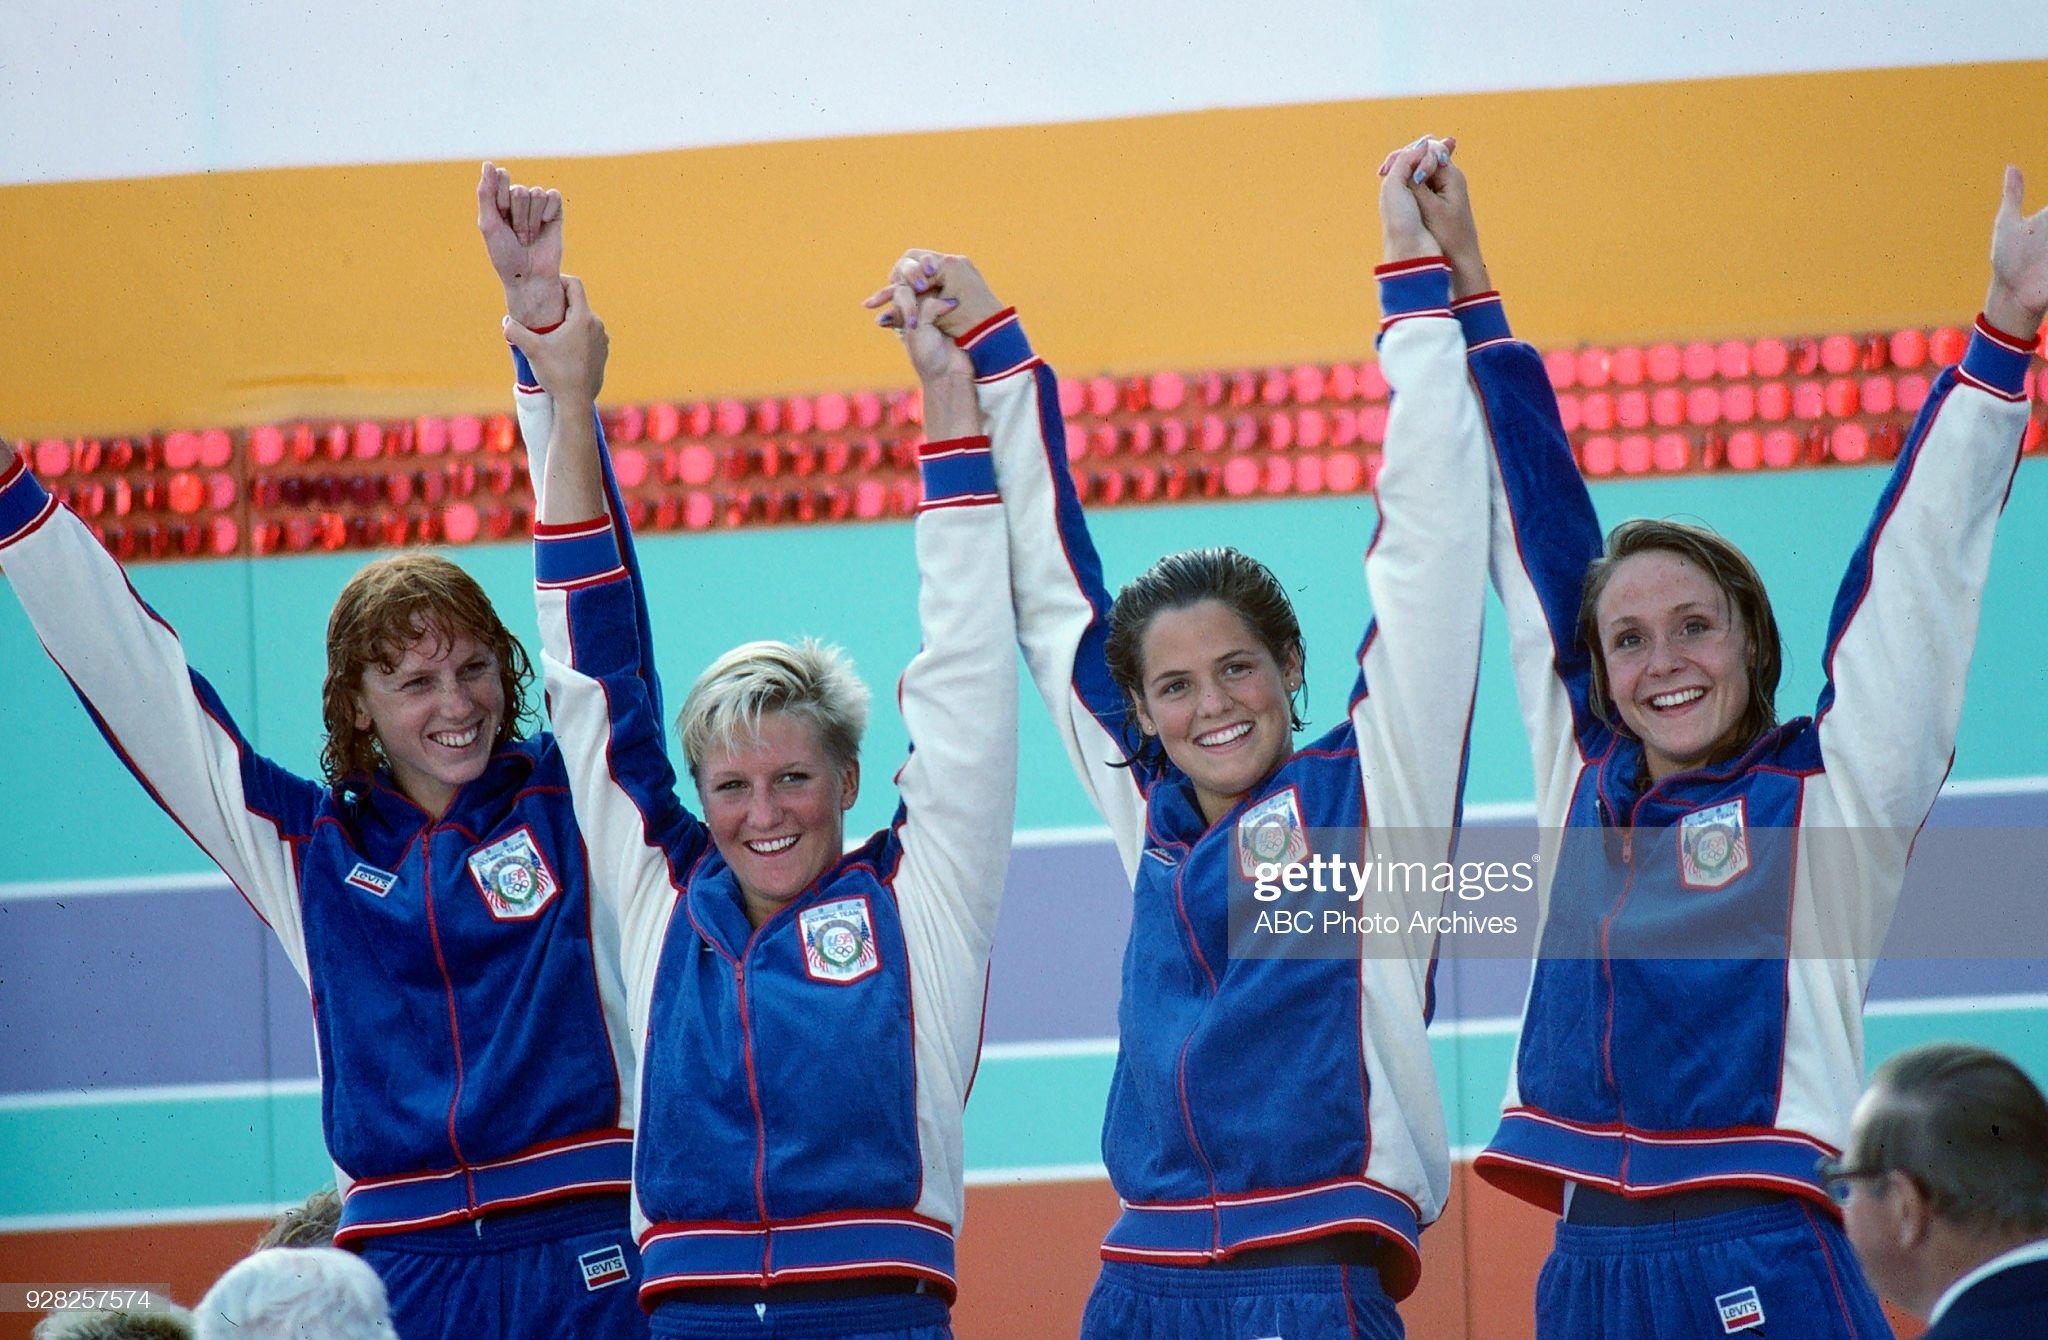 Women's Swimming 4 × 100 Metre Freestyle Relay Medal Ceremony At The 1984 Summer Olympics : Fotografía de noticias